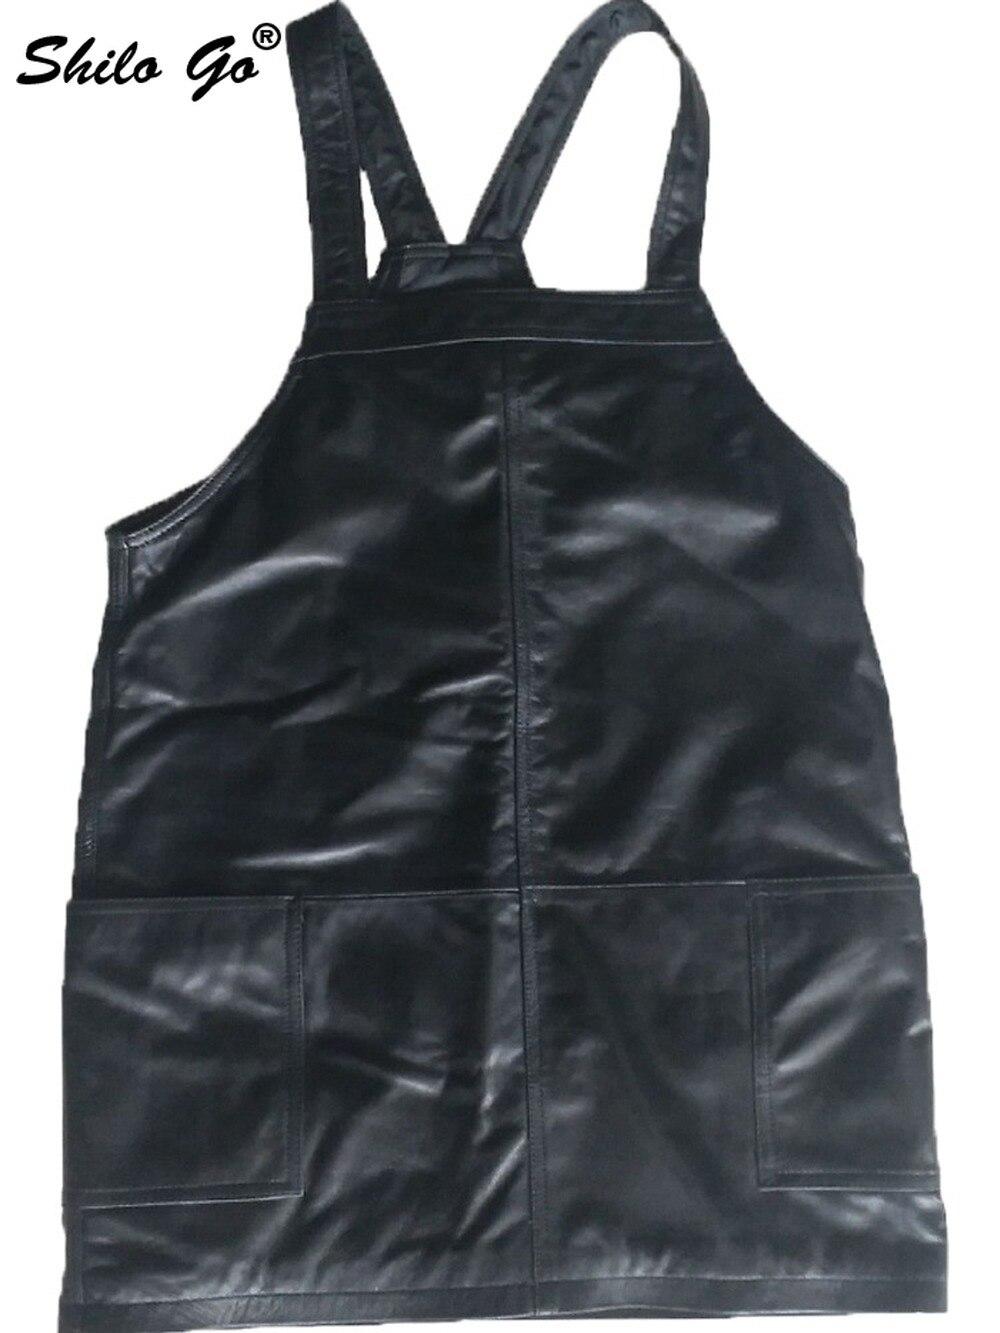 Genuine Leather Dress Black Solid Sleeveless Strap Dress Women Autumn Casual Plus Size Pocket Front Backless Sheepskin Dresses - 2